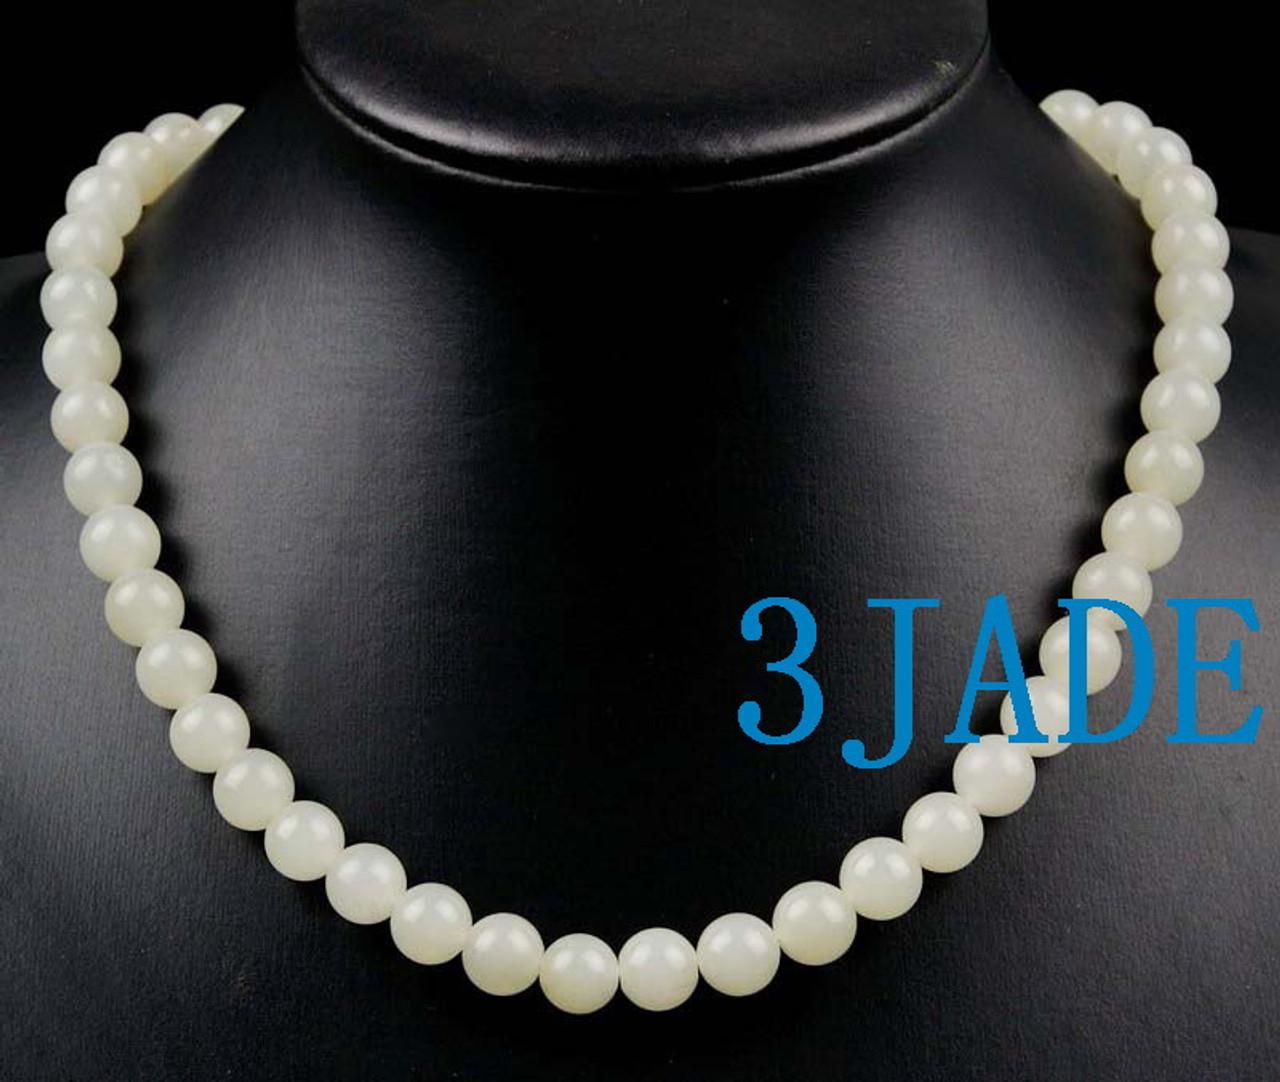 White nephrite jade necklace